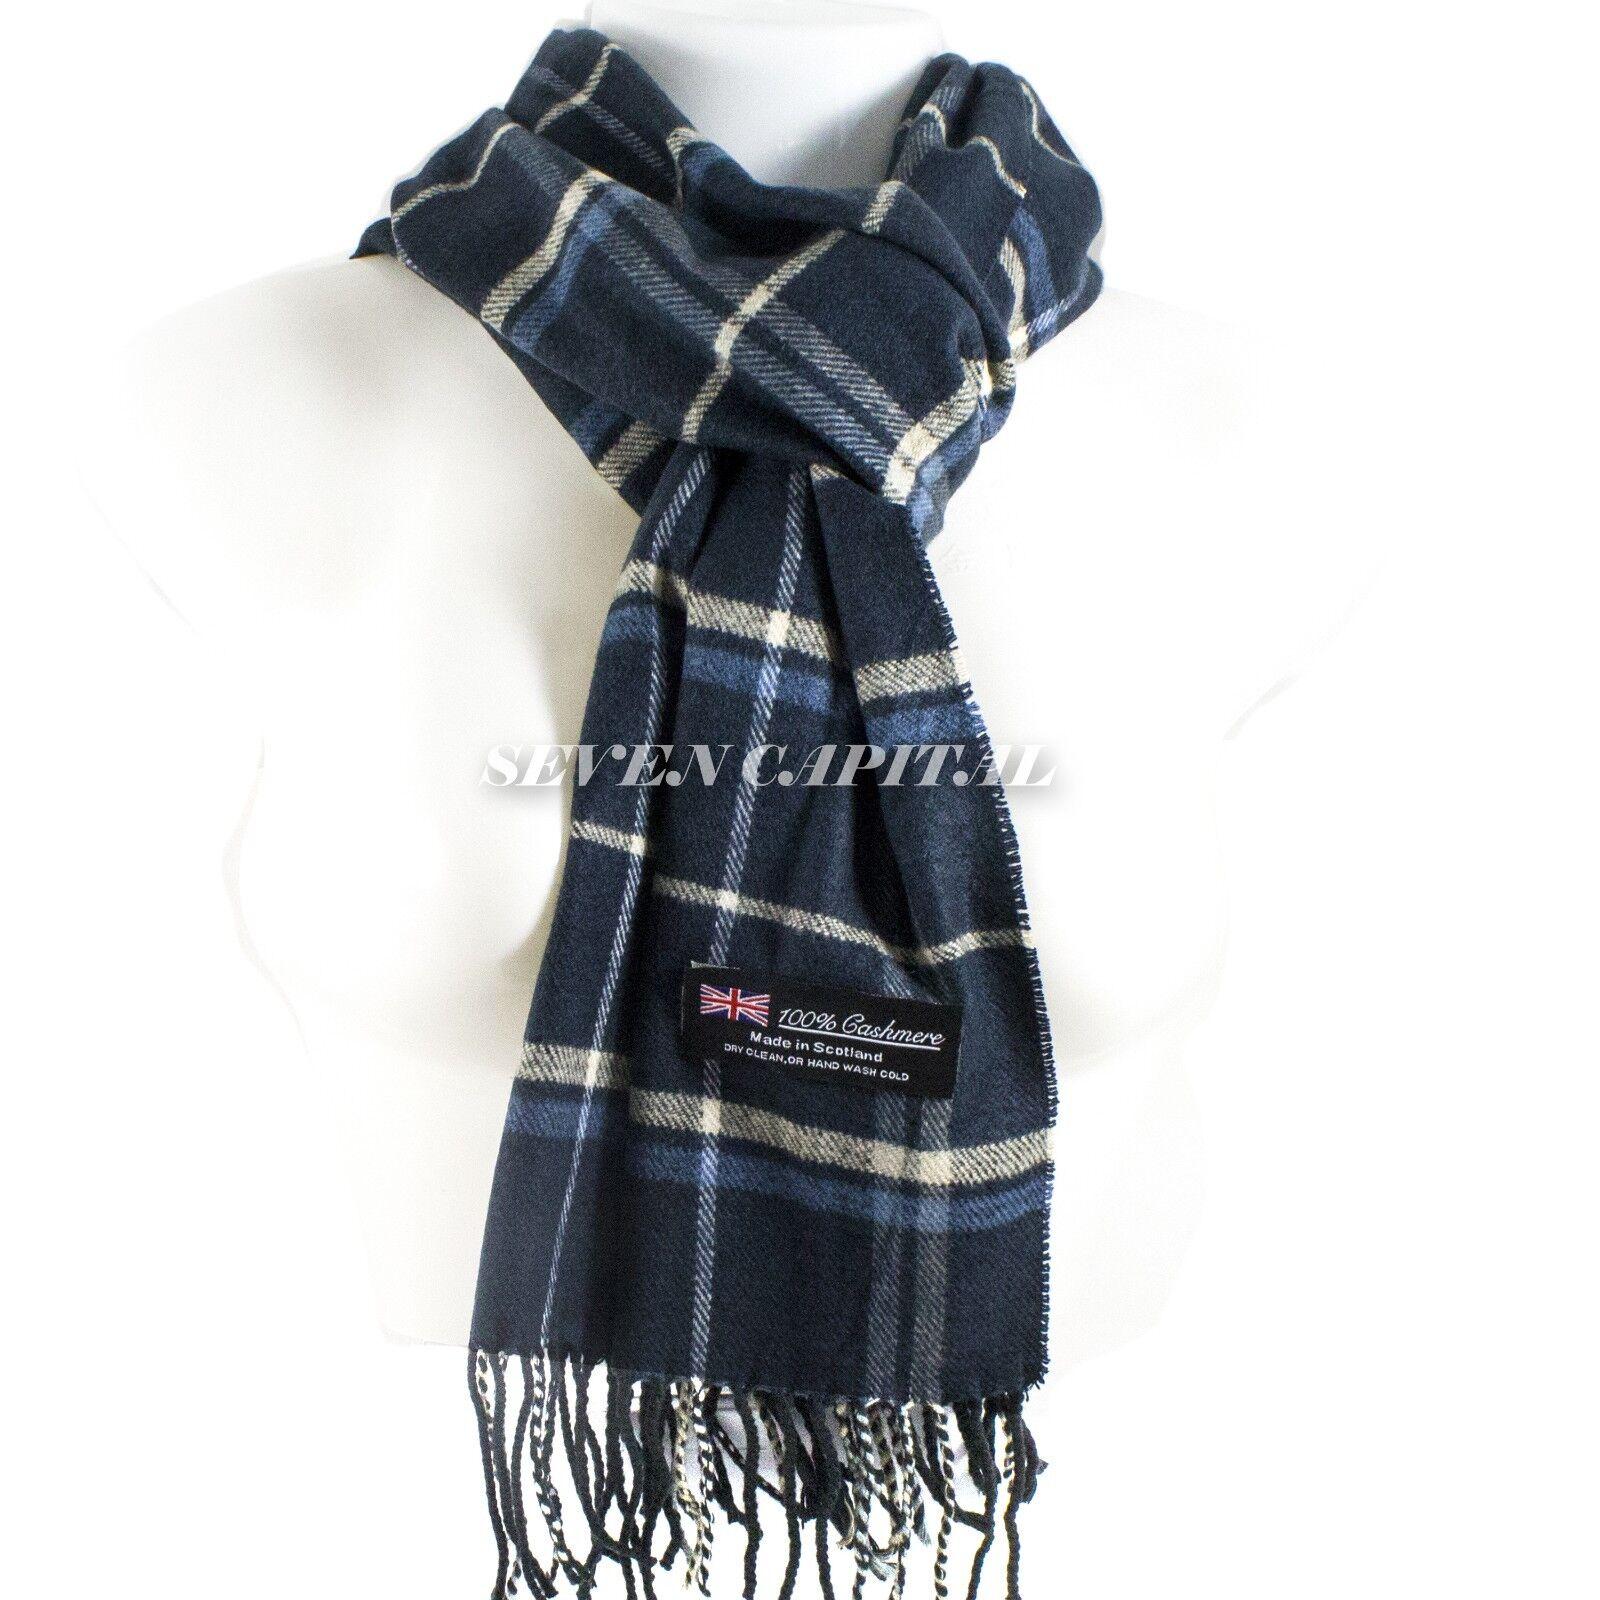 Mens Womens Winter Warm SCOTLAND Made 100% CASHMERE Scarf Scarves Plaid Wool 20. Plaid: Navy/Beige/White